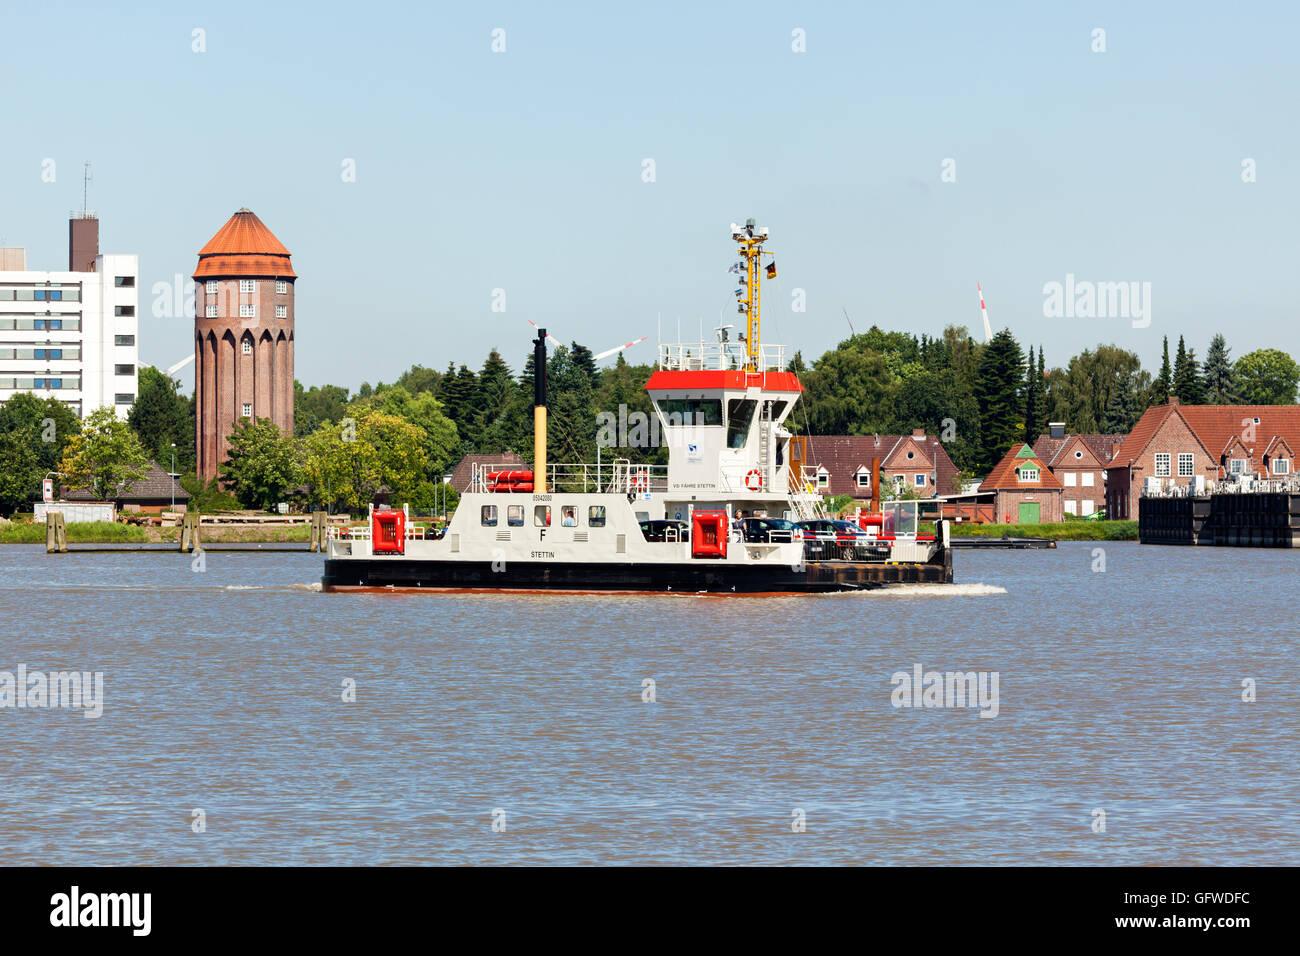 Car ferry crossing Kiel Canal at Brunsbüttel, historic water reservoir tower in background - Stock Image